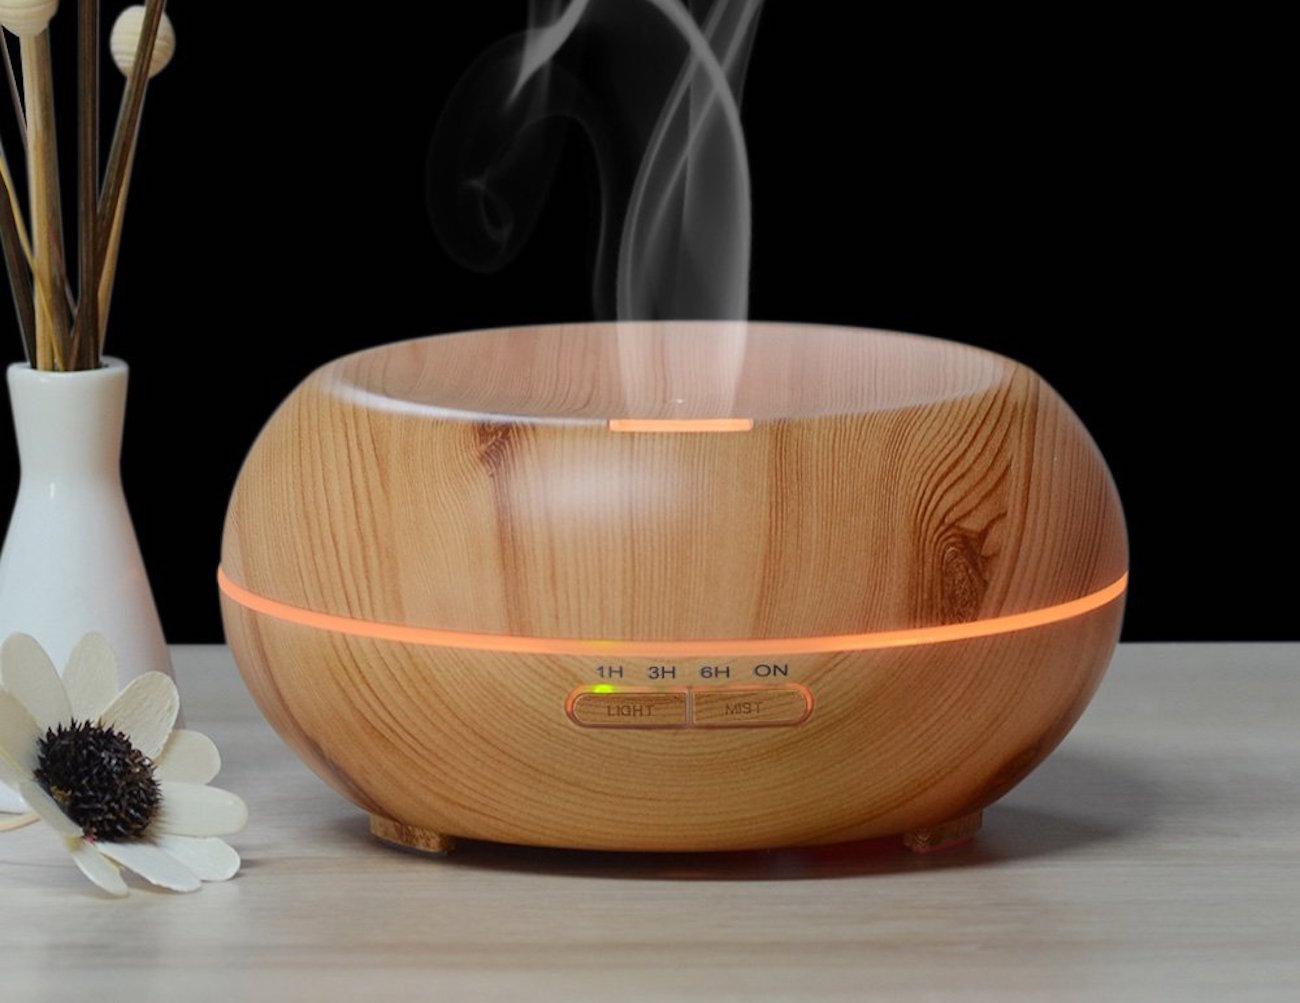 InnoGear+Wood+Grain+Ultrasonic+Oil+Diffuser